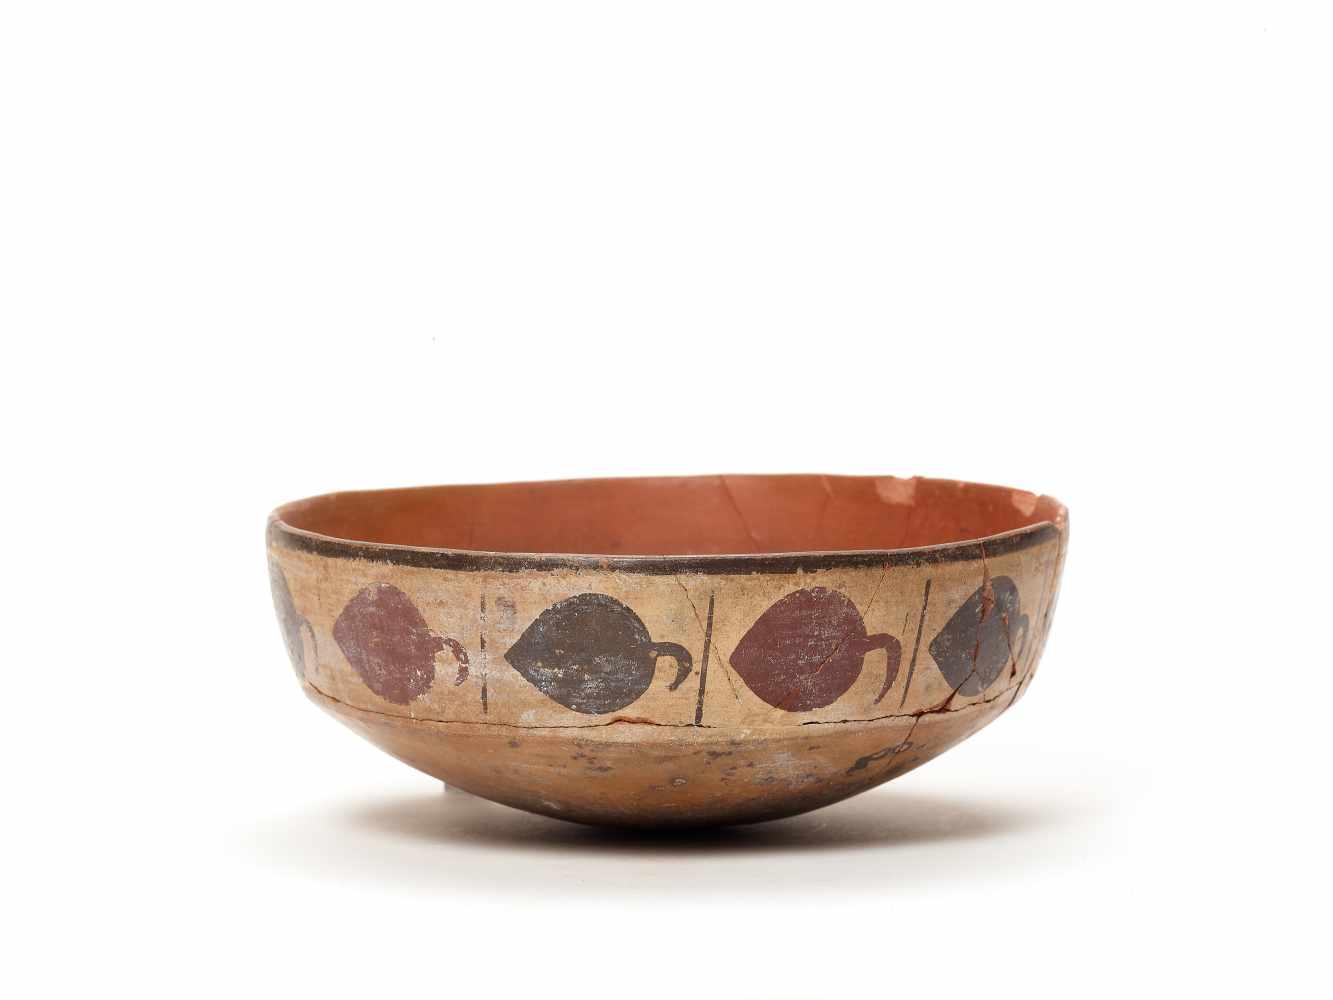 BOWL WITH BAND DECORATION - NAZCA, PERU, C. 300-600 ADPainted clayNazca, Peru, c. 300-600 ADArched